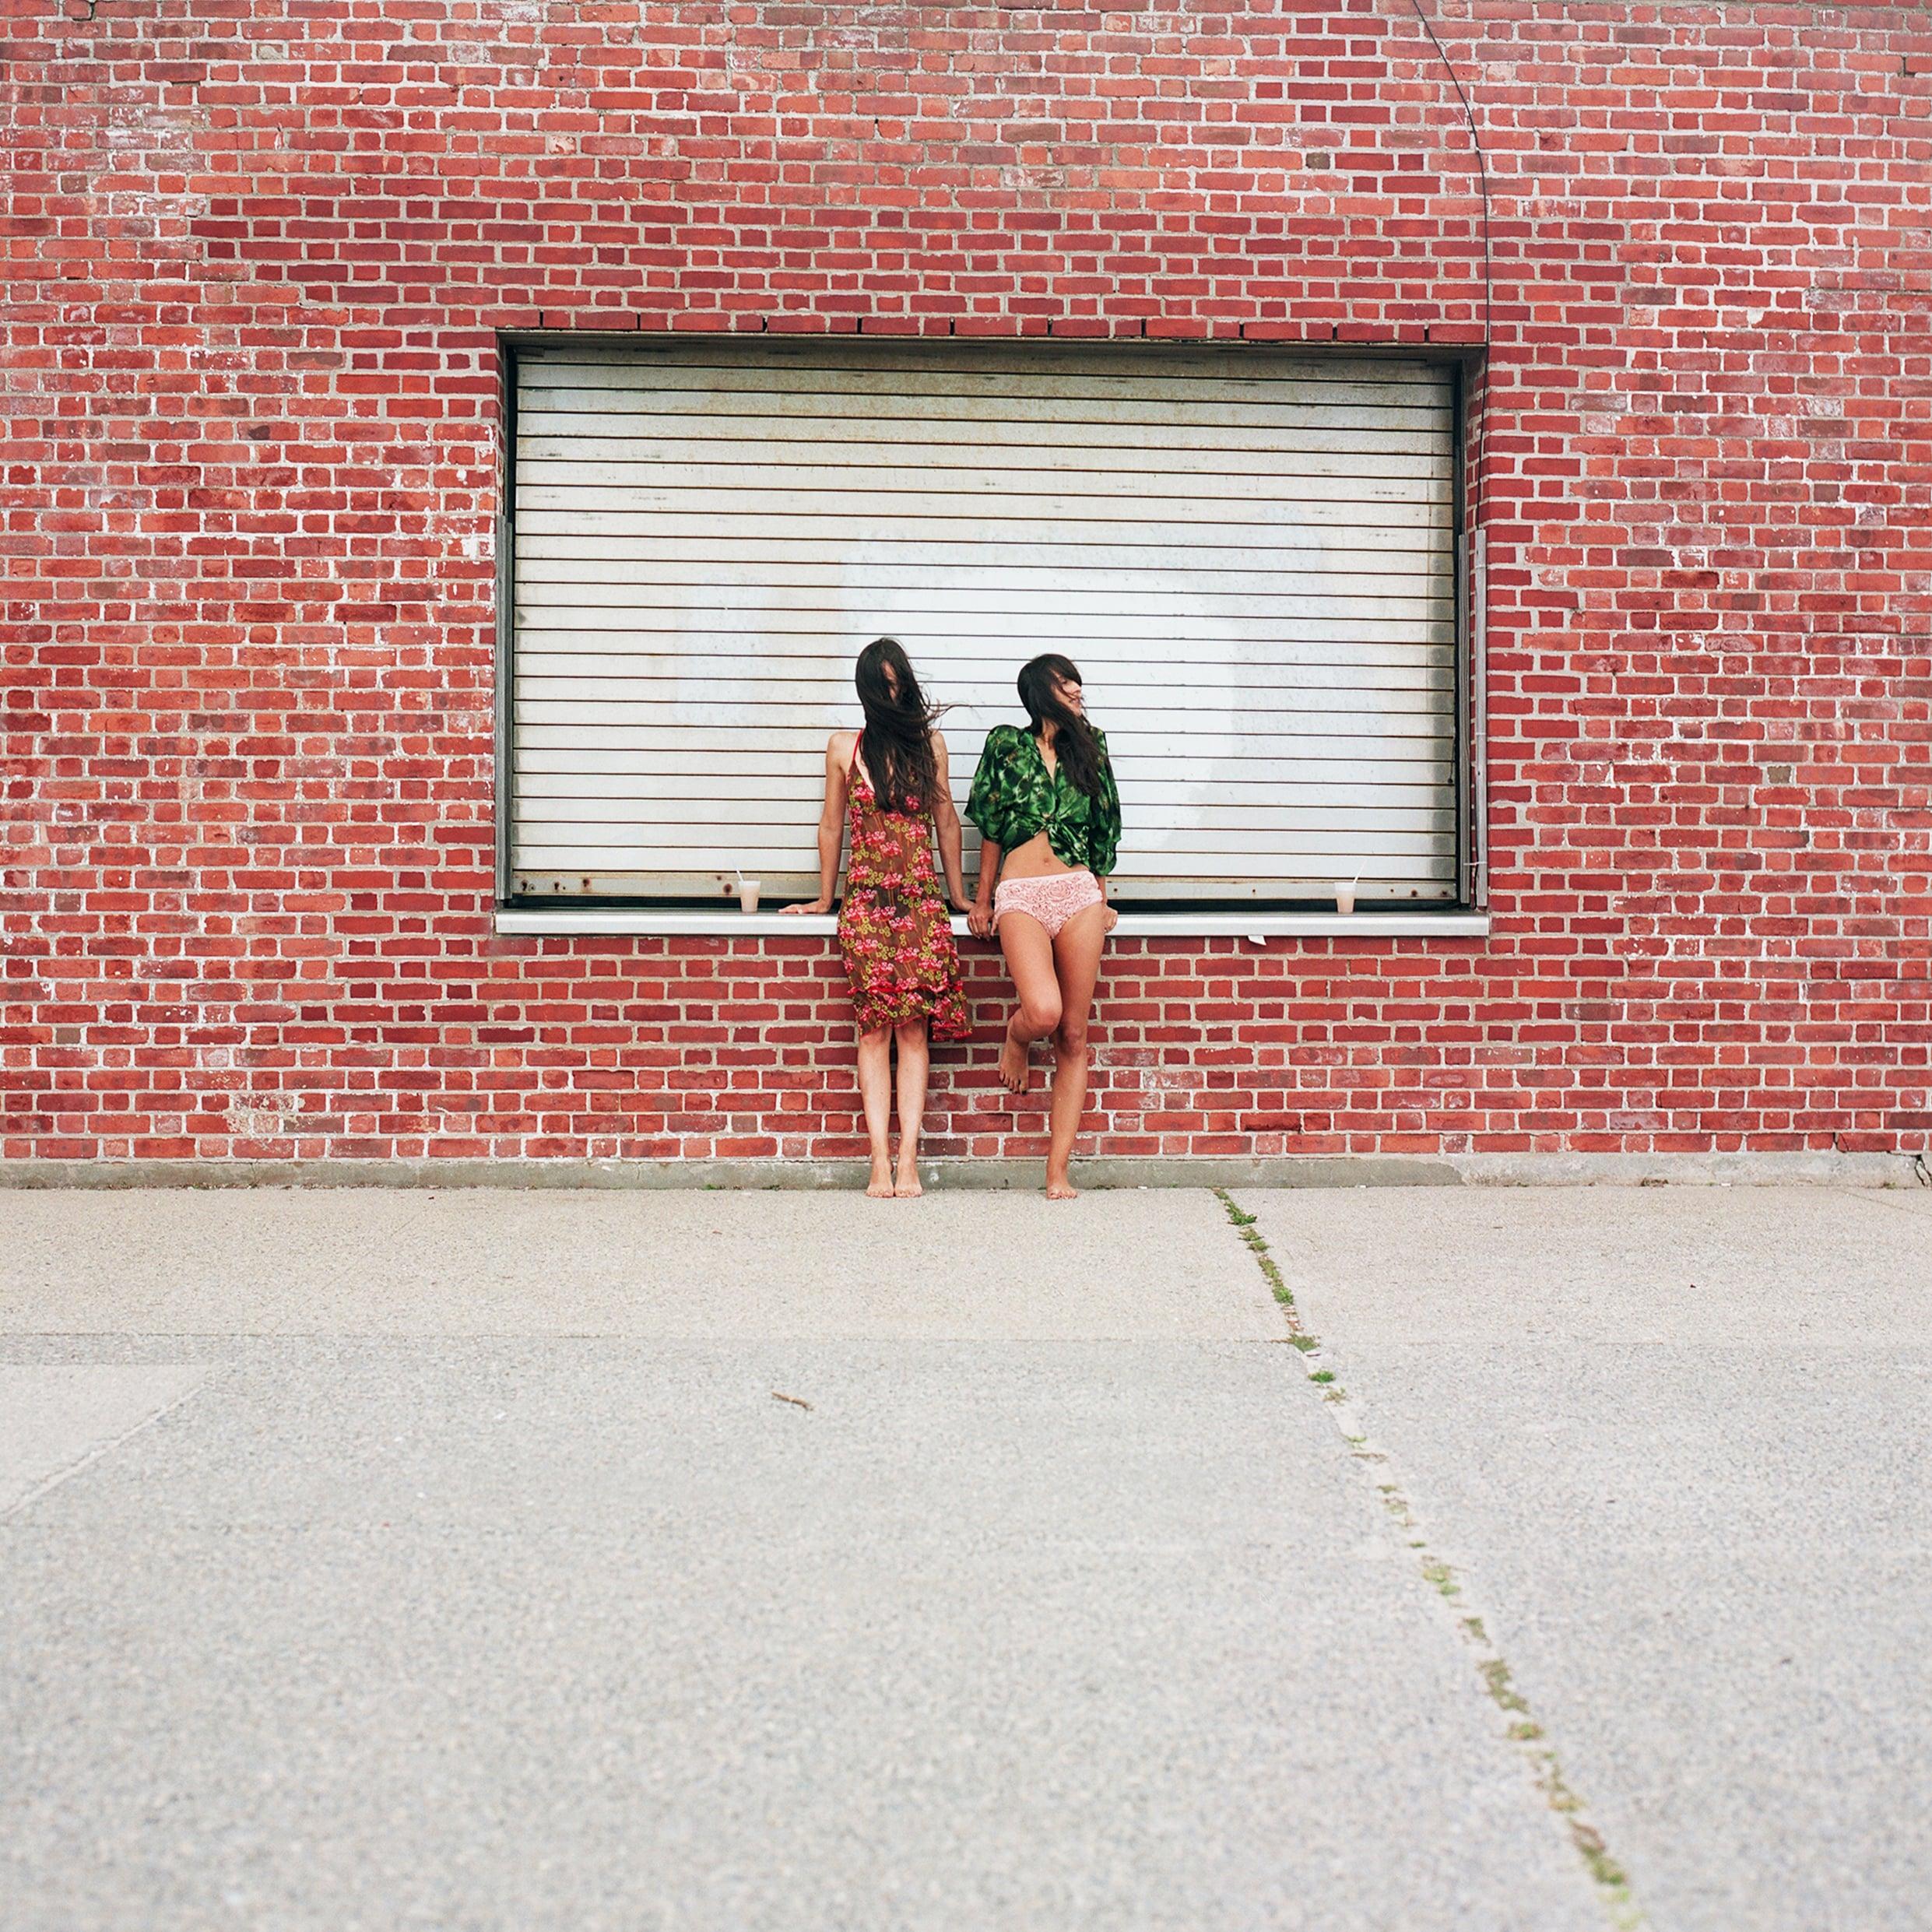 Christina-Arza-Women